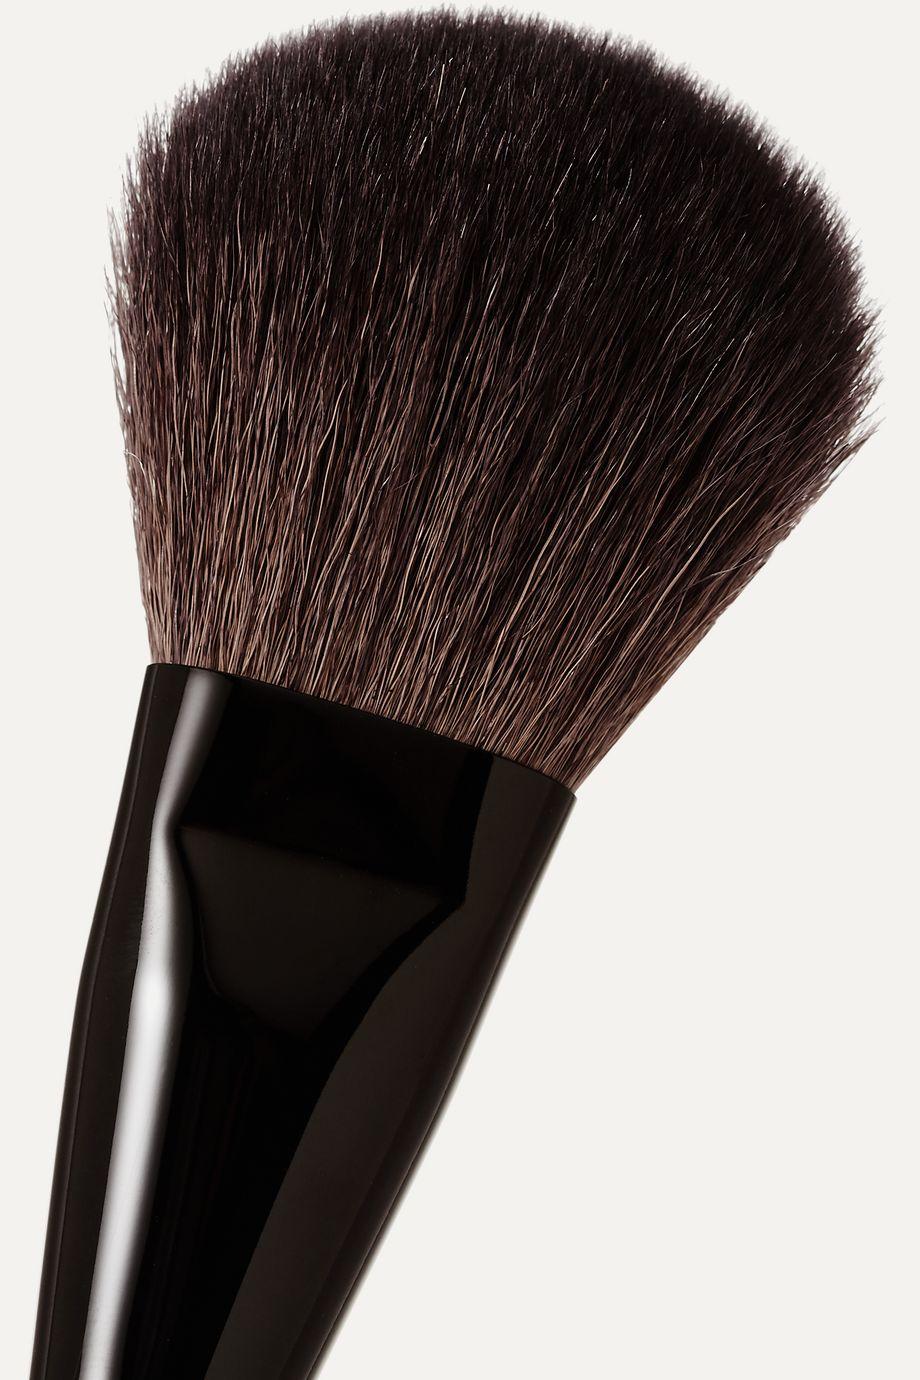 Yves Saint Laurent Beauty Powder Brush